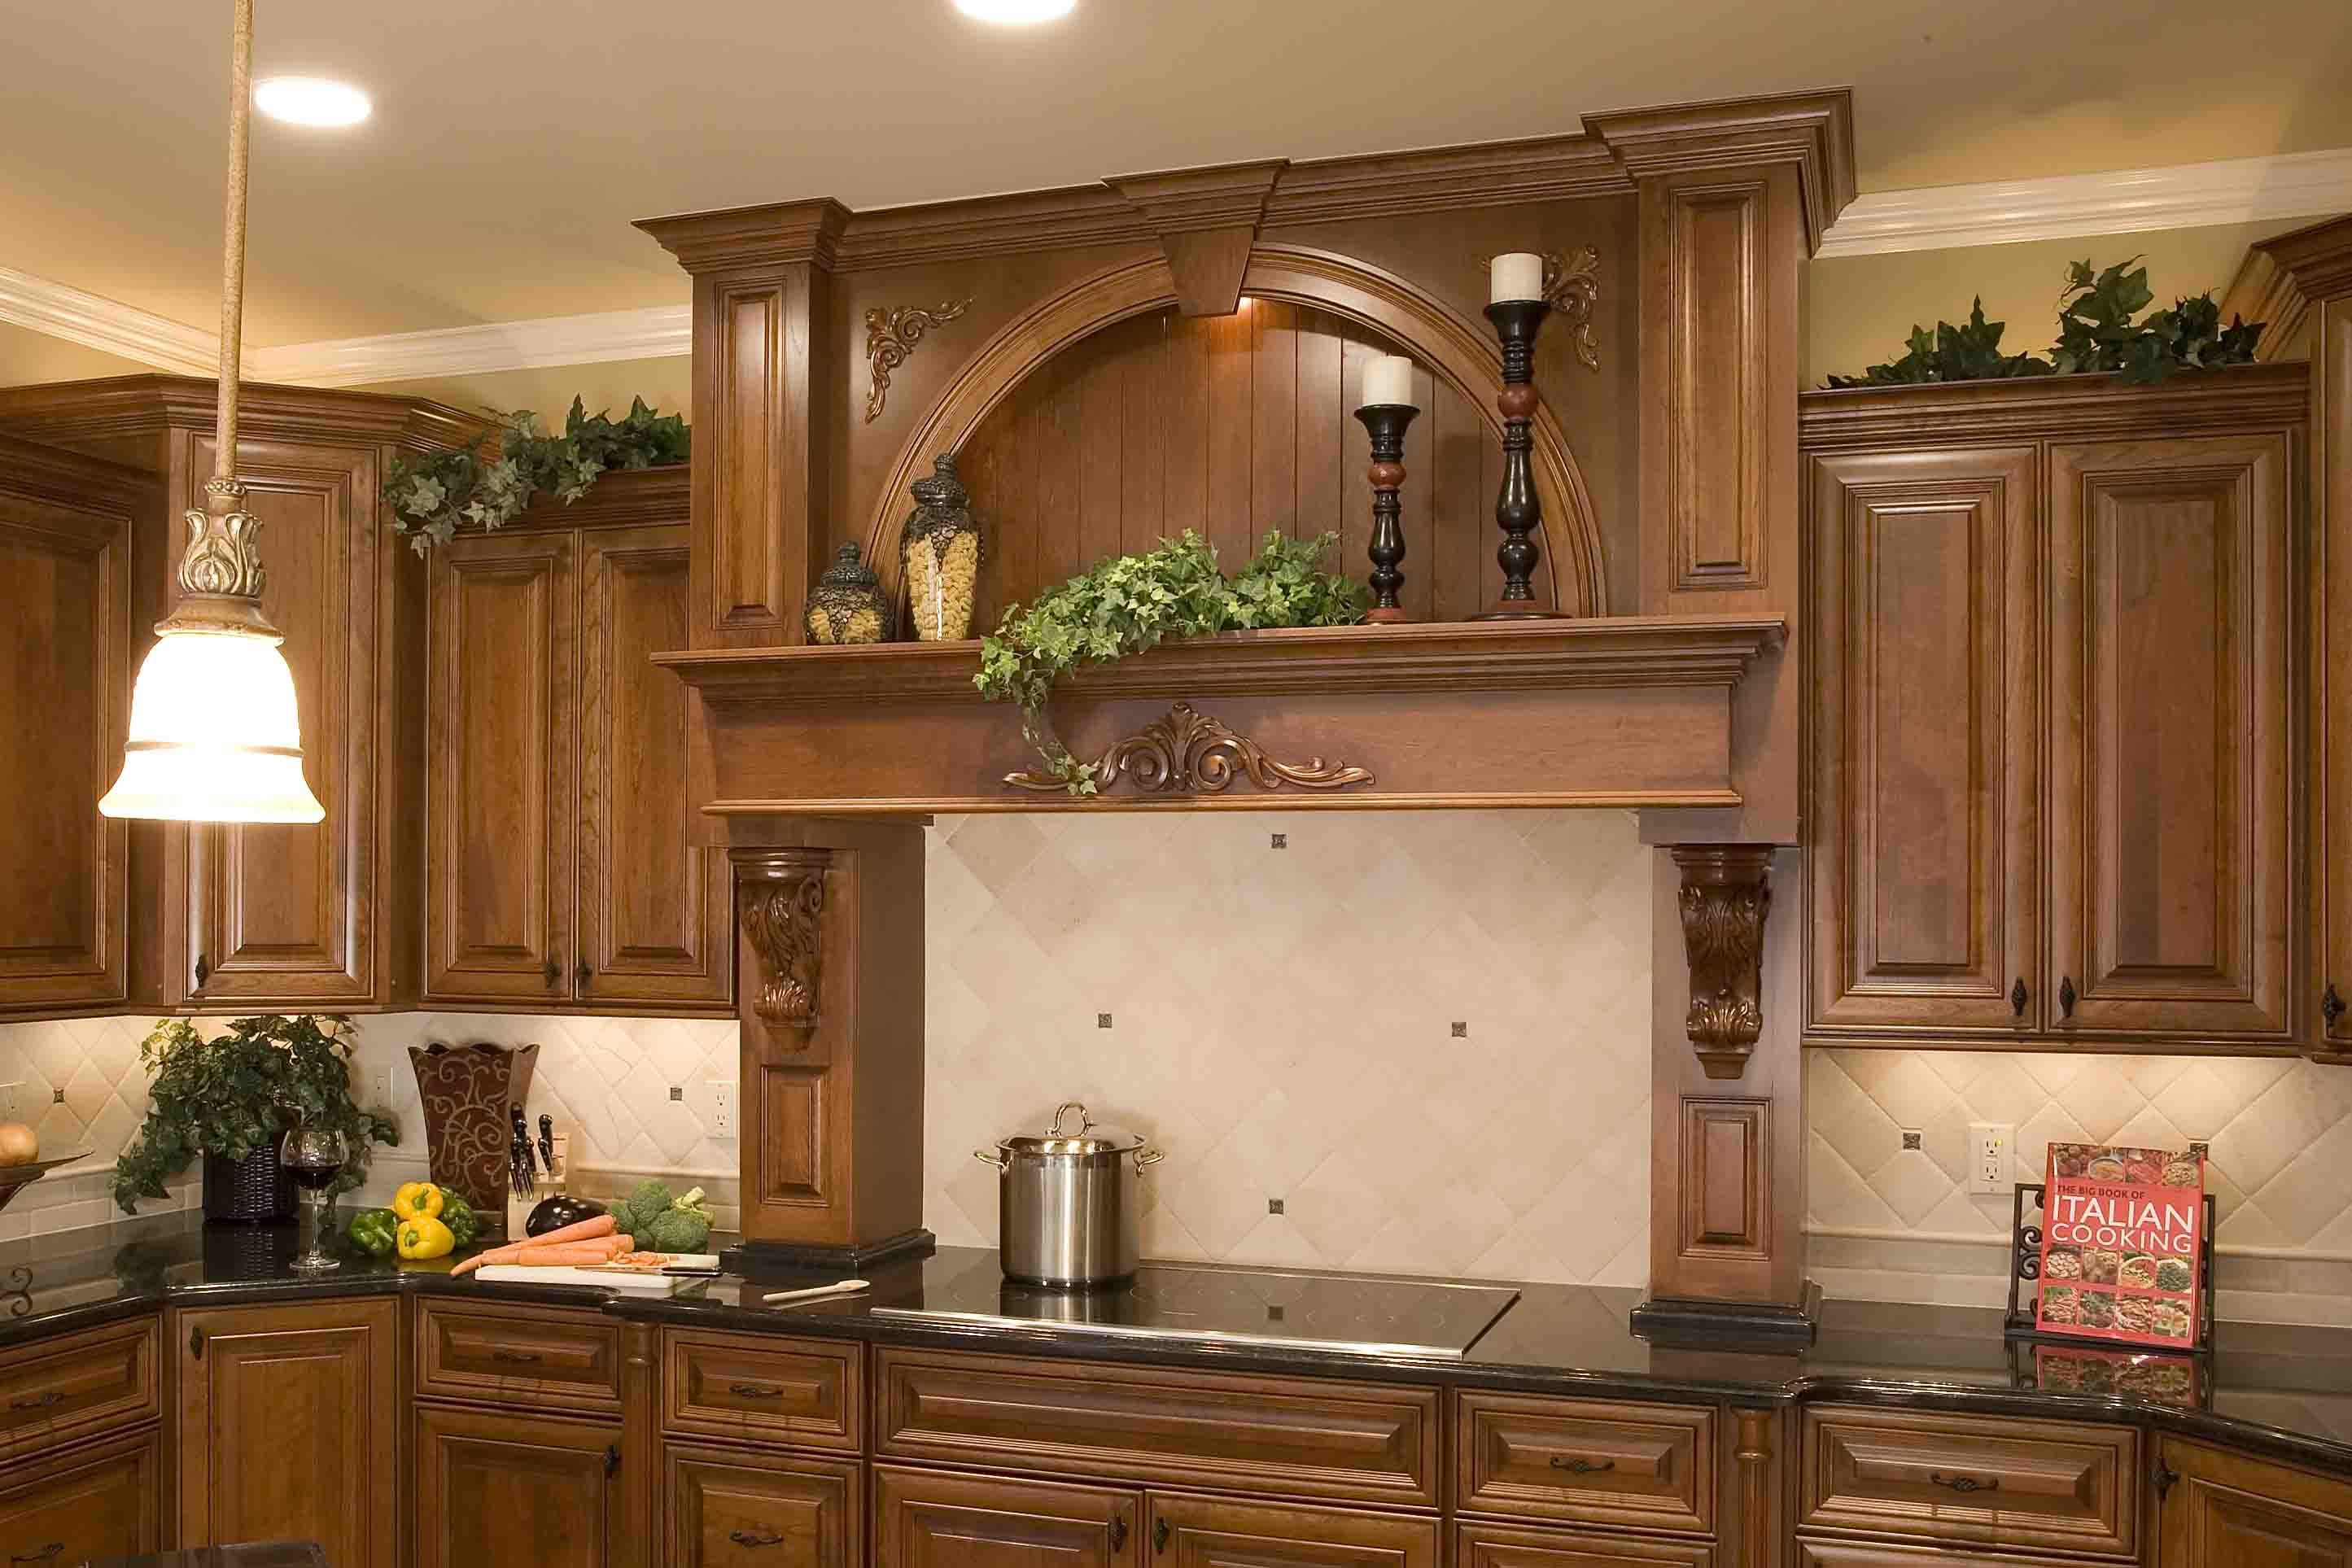 Kitchen Cabinet Over Stove Wood Range Hood With Display Niche